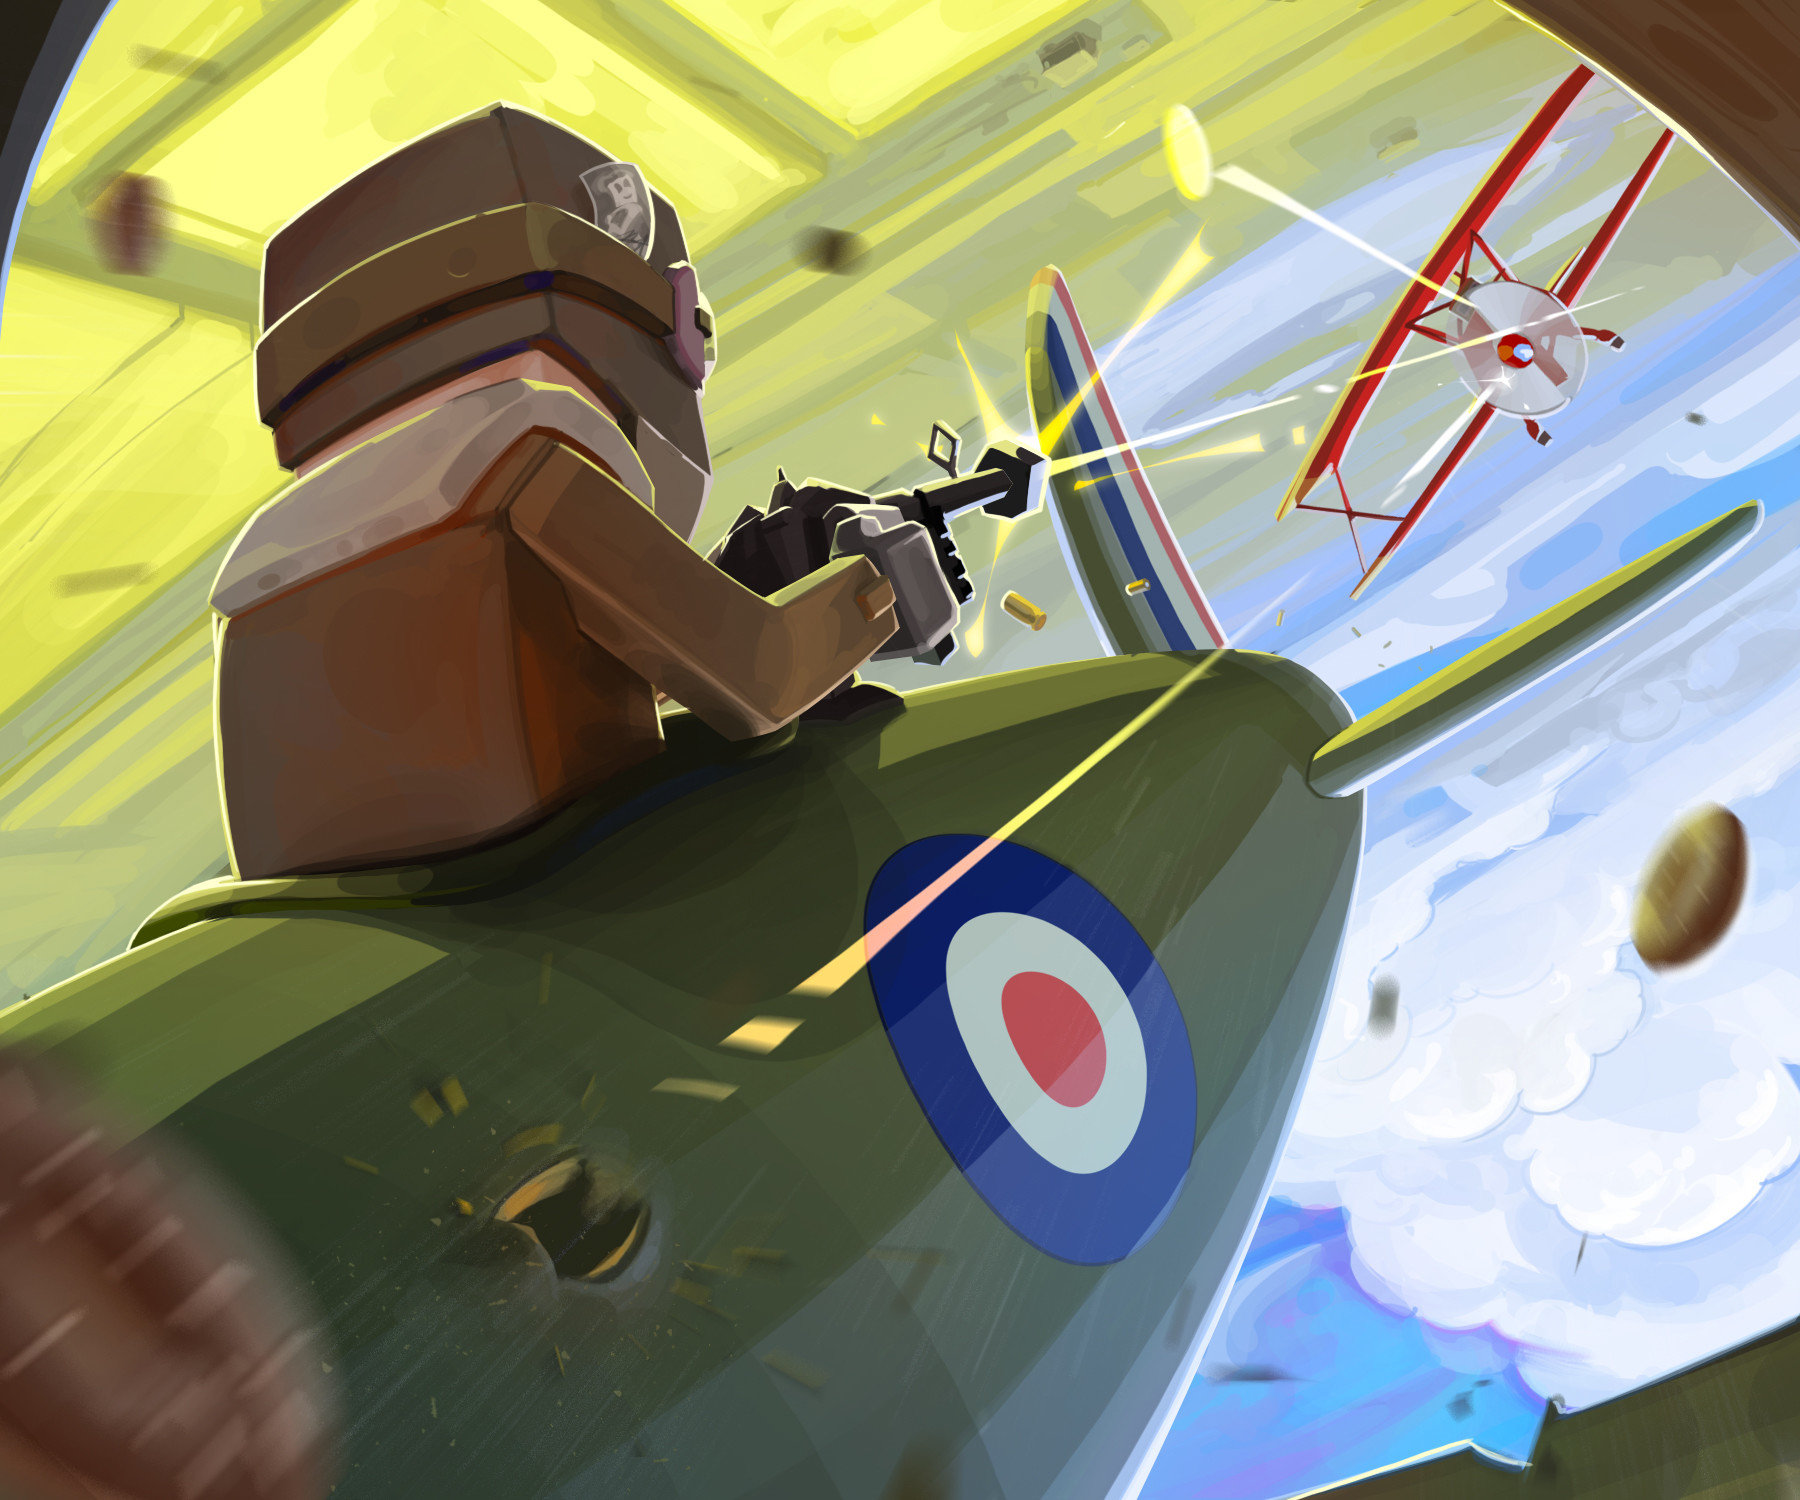 Nicolas morales world war i flying aces illustration doughnut